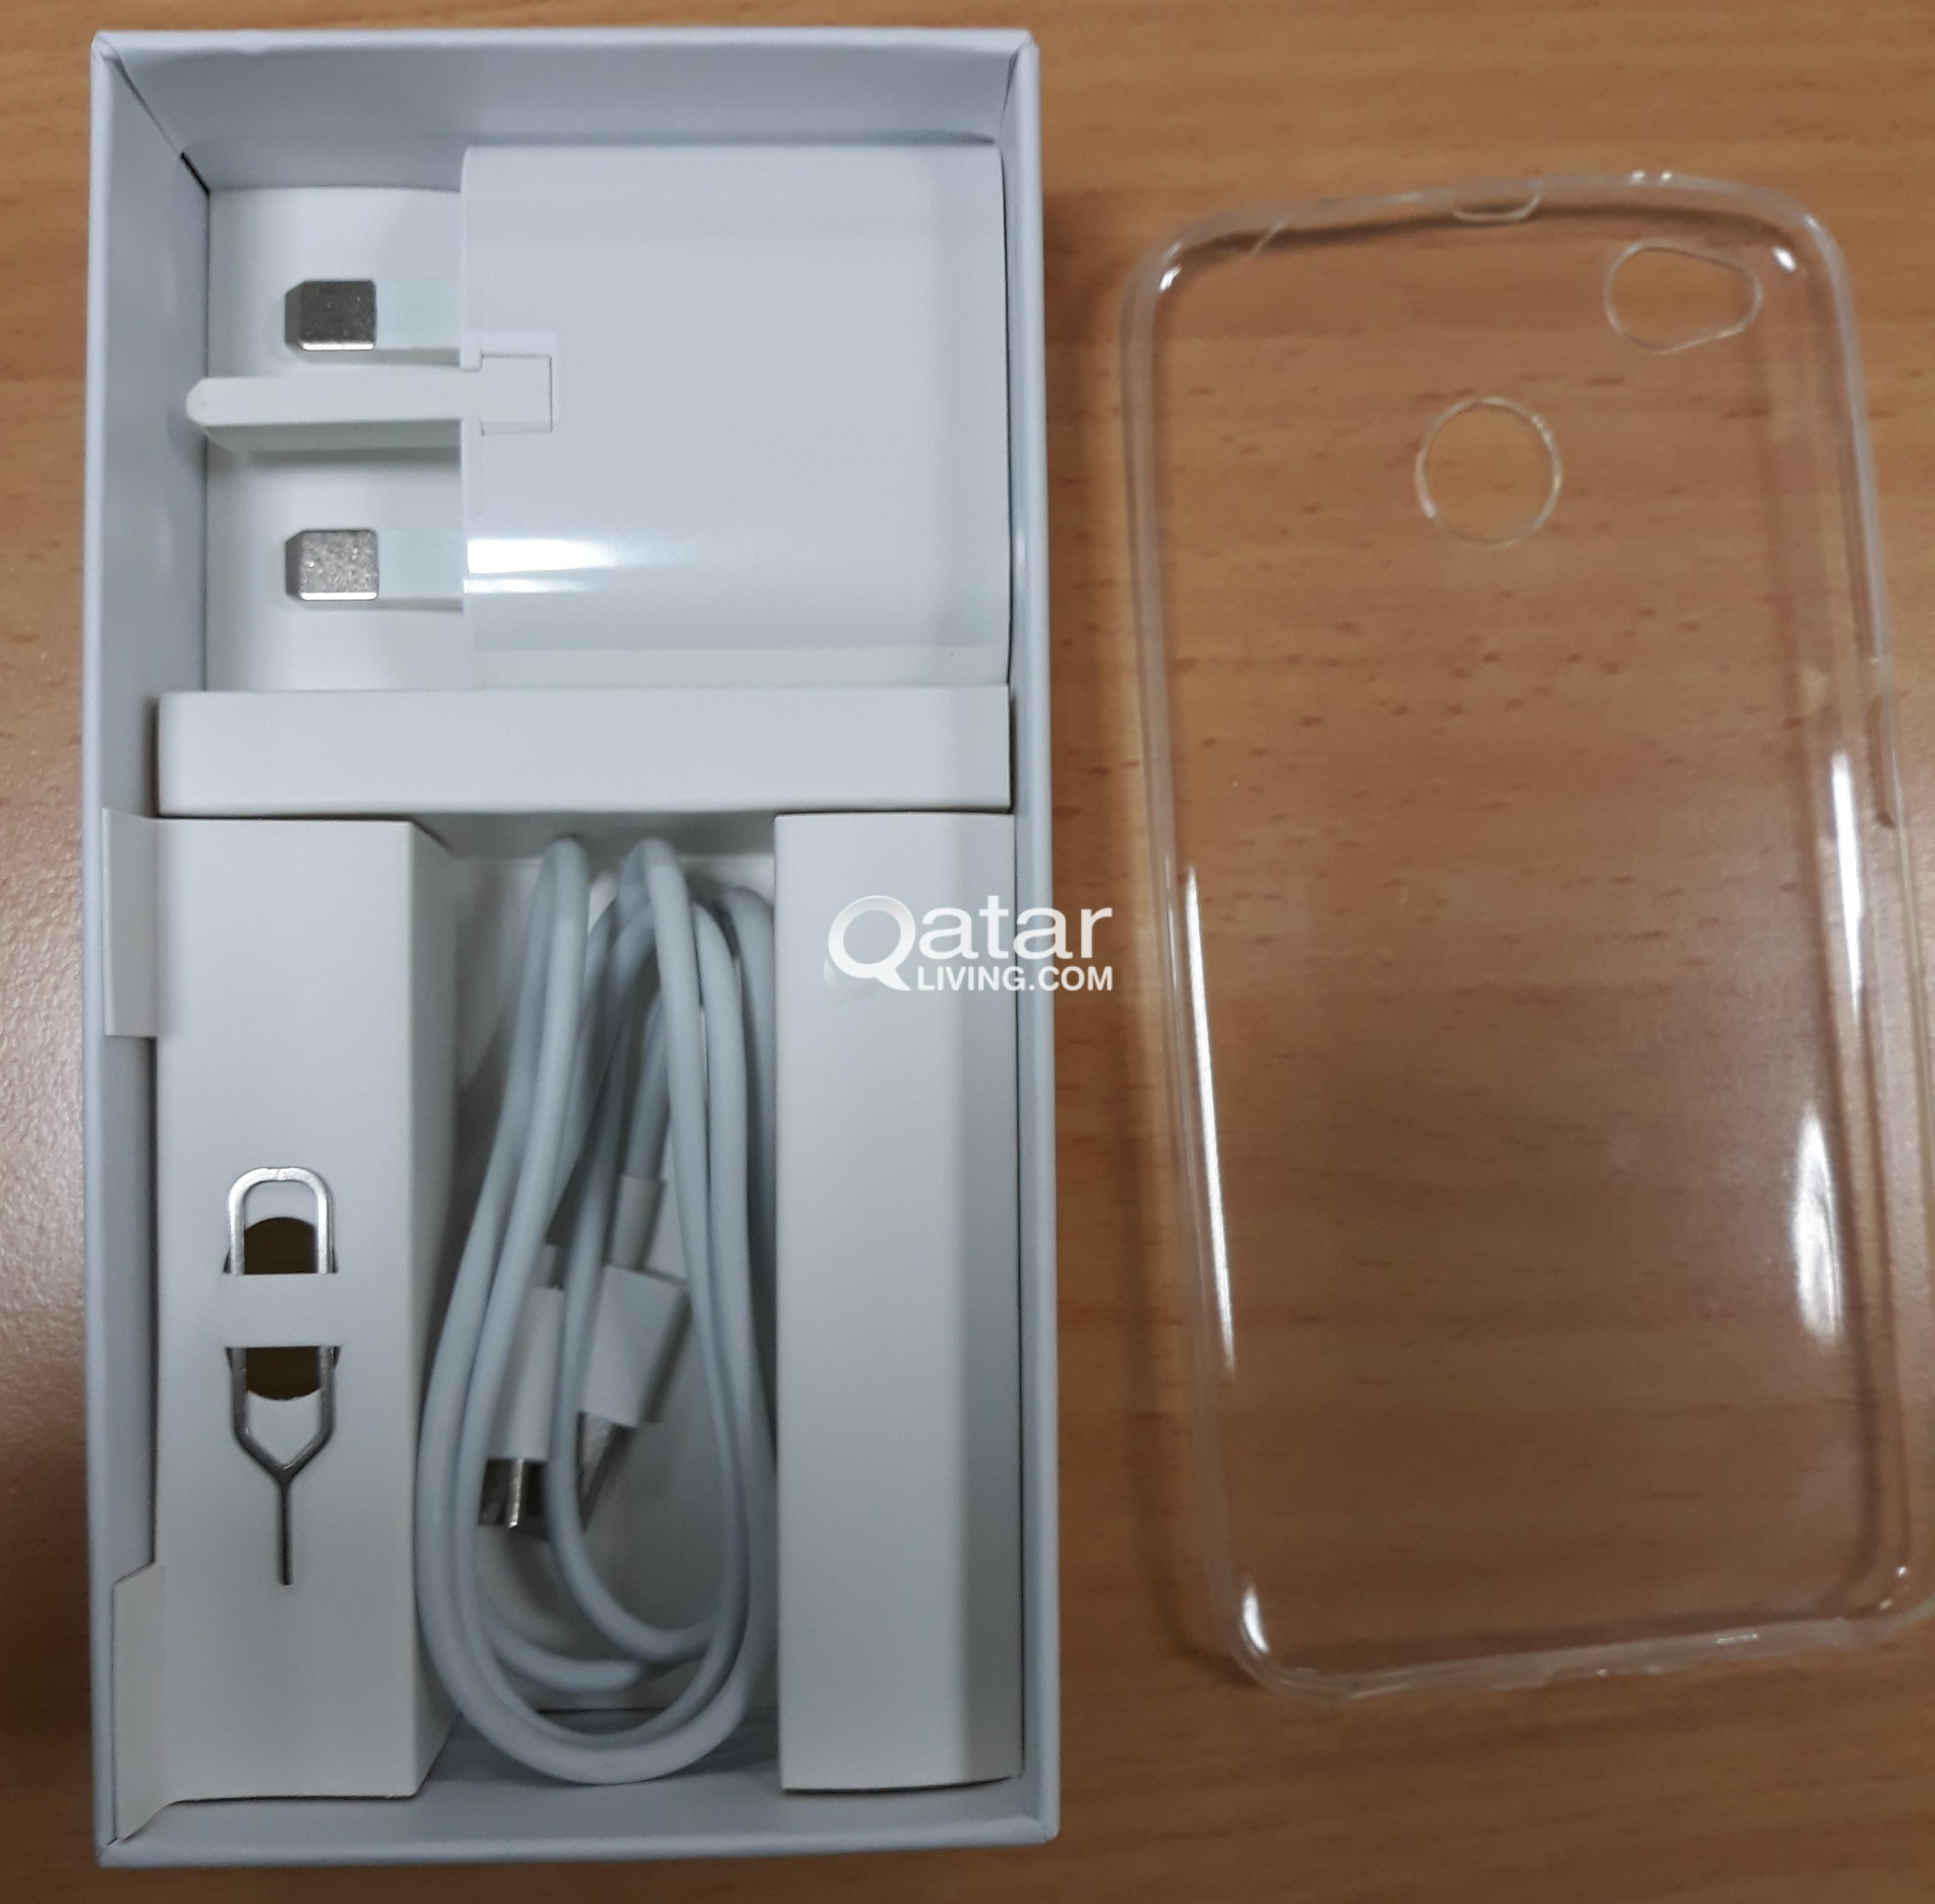 Xiaomi Redmi 4x Black 3 32 Gb For Sale Qatar Living